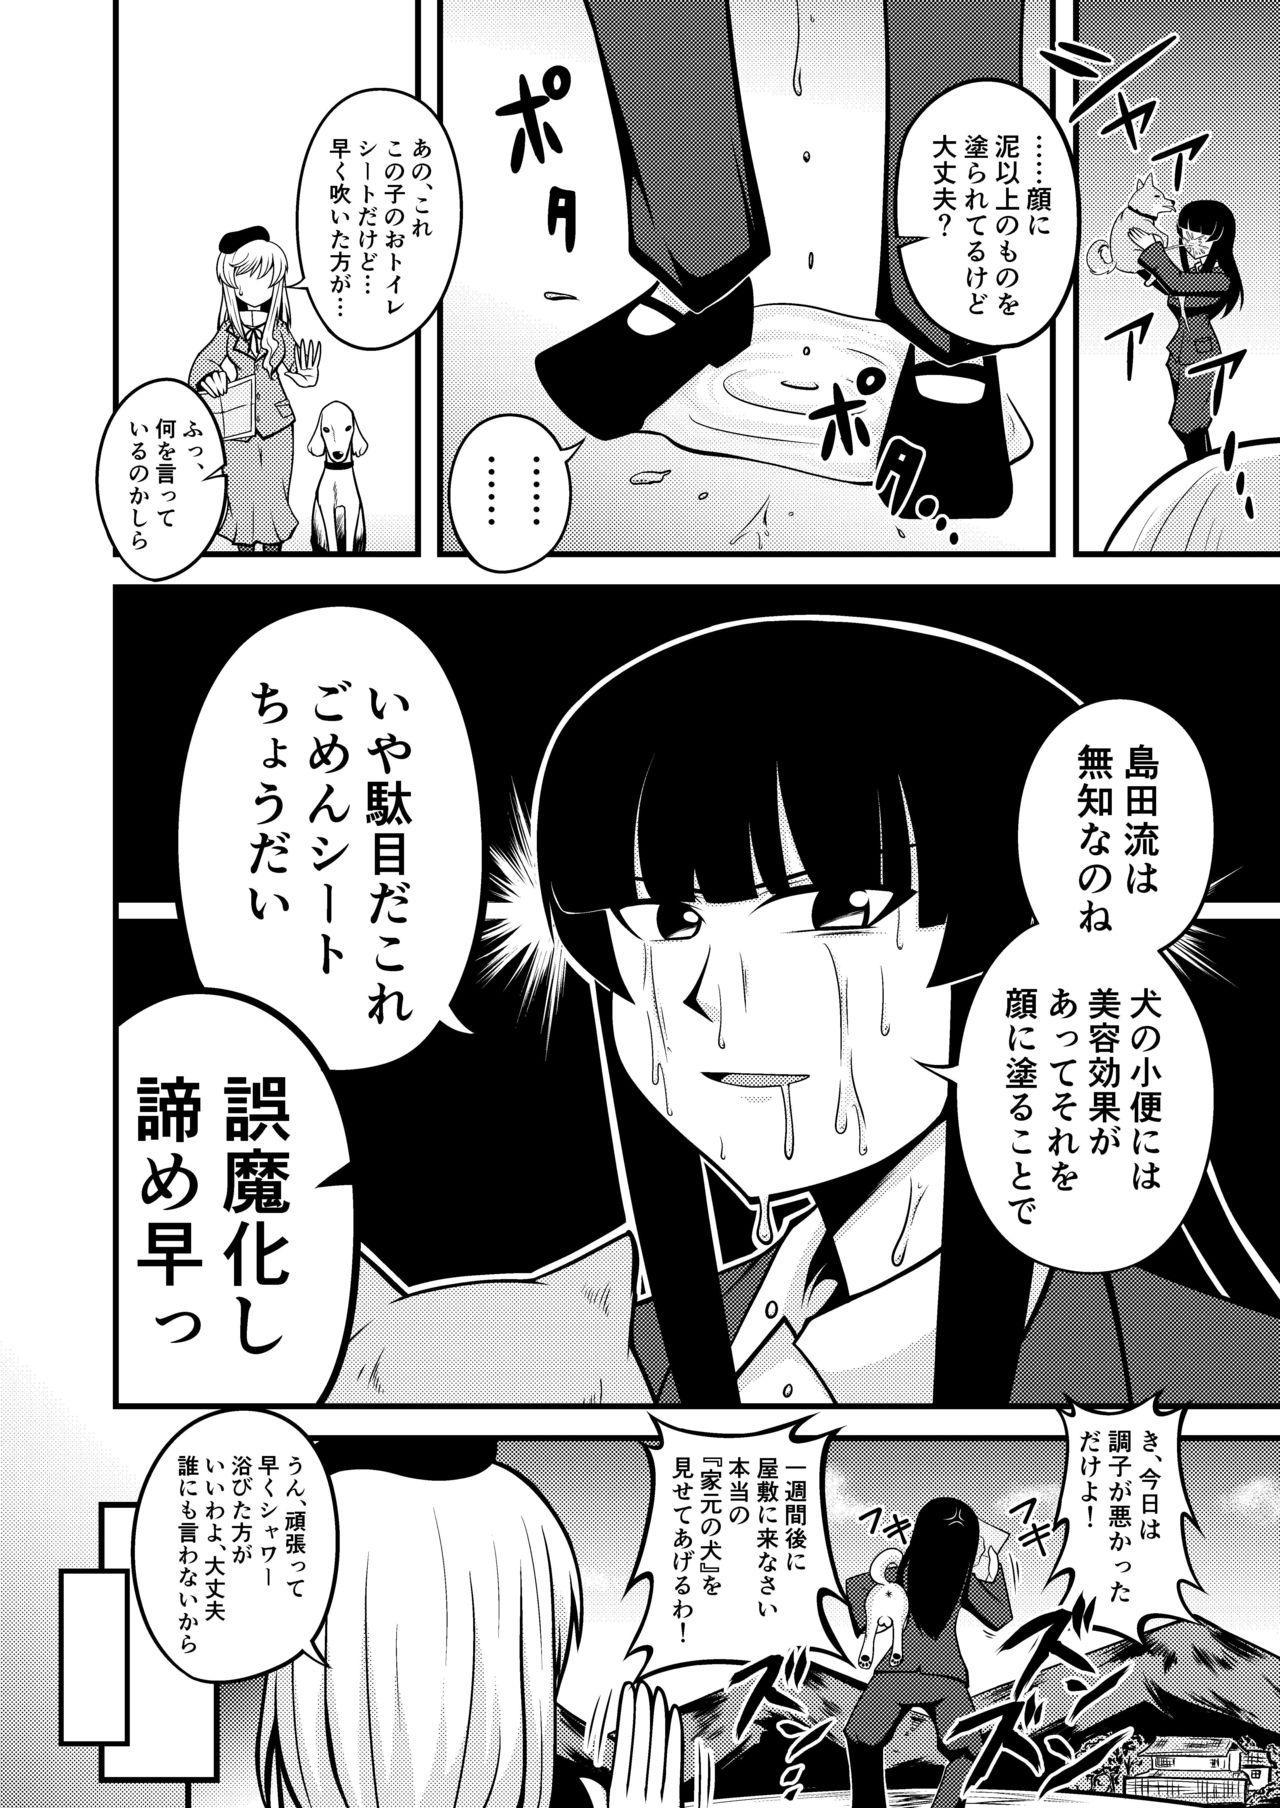 Garupan Iemoto Manga 『Iemoto no Inu』 3